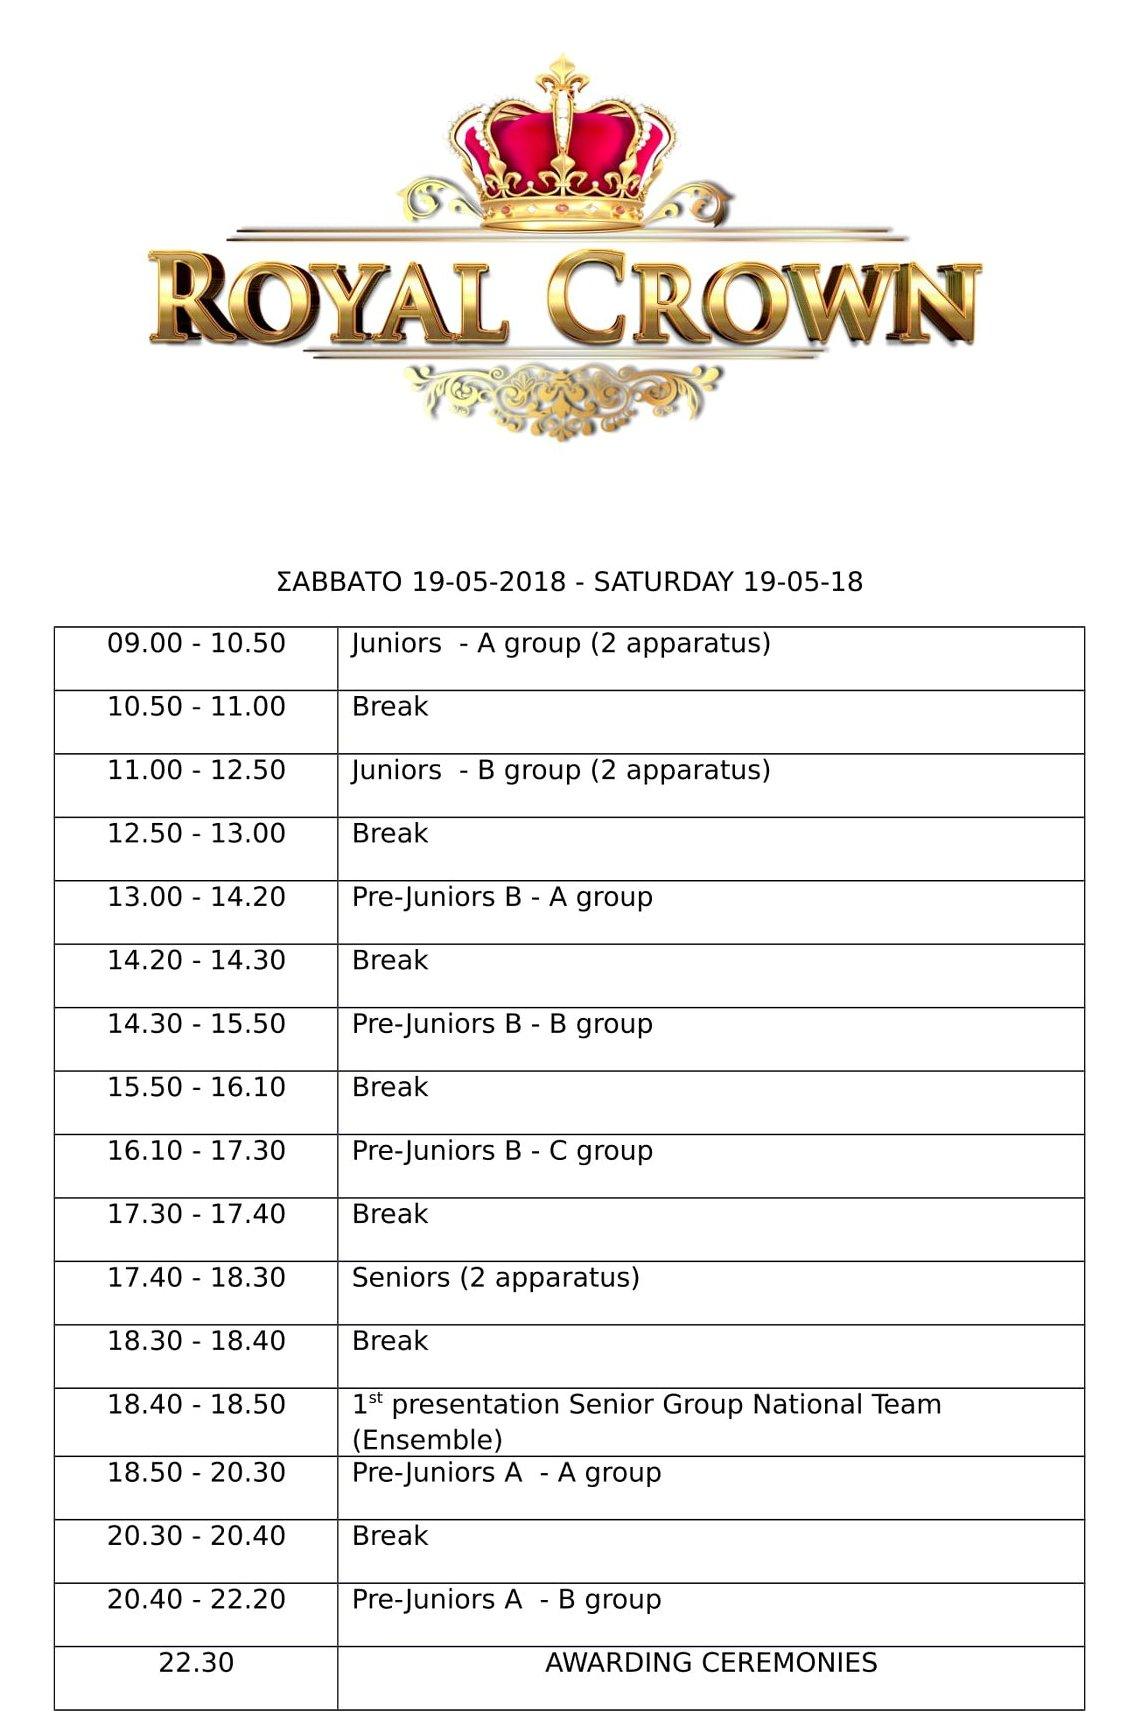 royalcrown2018_schedule_day2